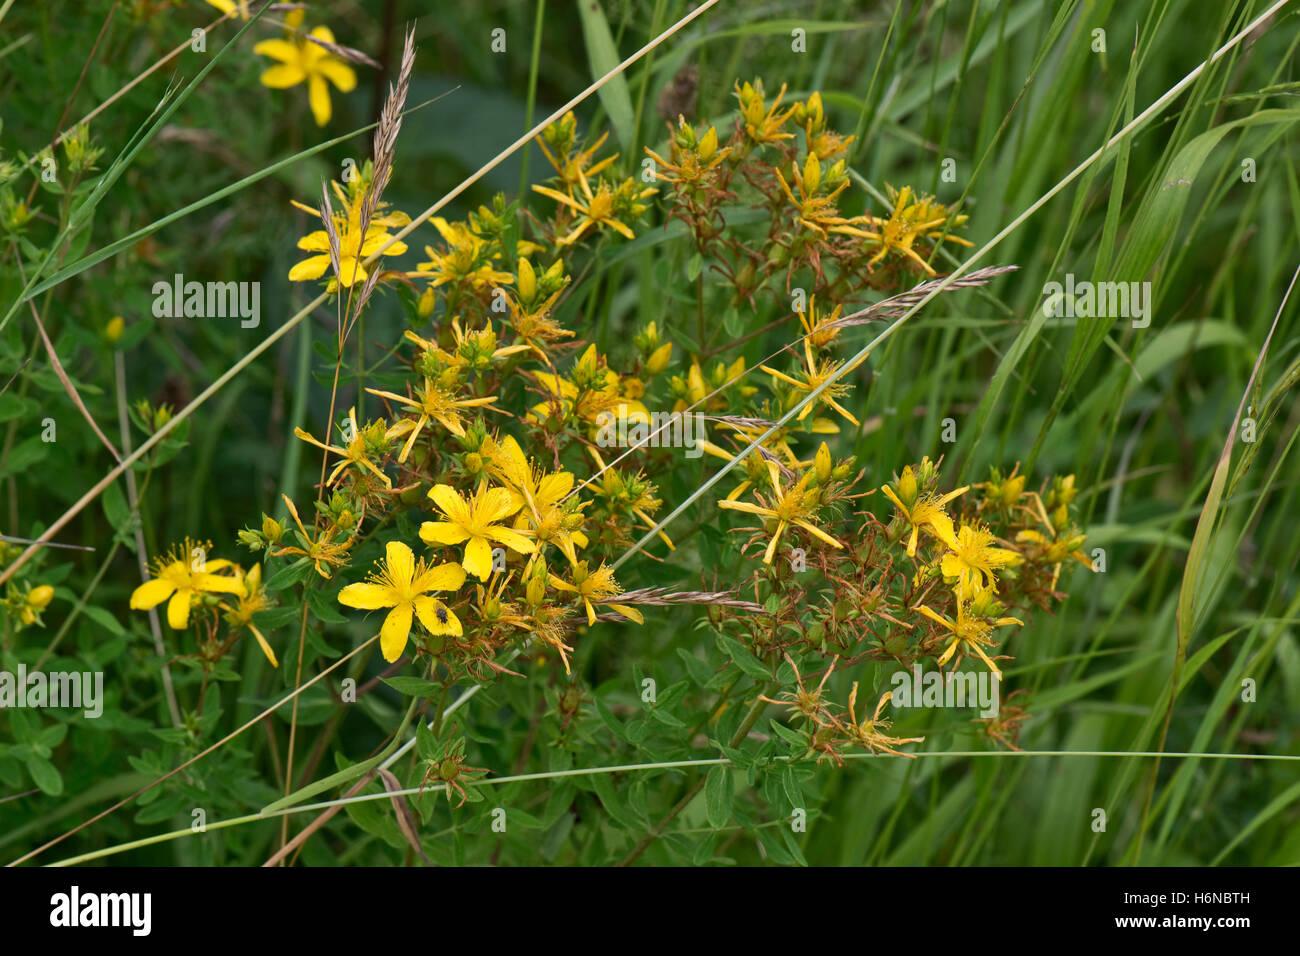 Perforate St.John's wort, Hypericum perforatum, yellow flowering plant on downland scrub, Berkshire, July - Stock Image